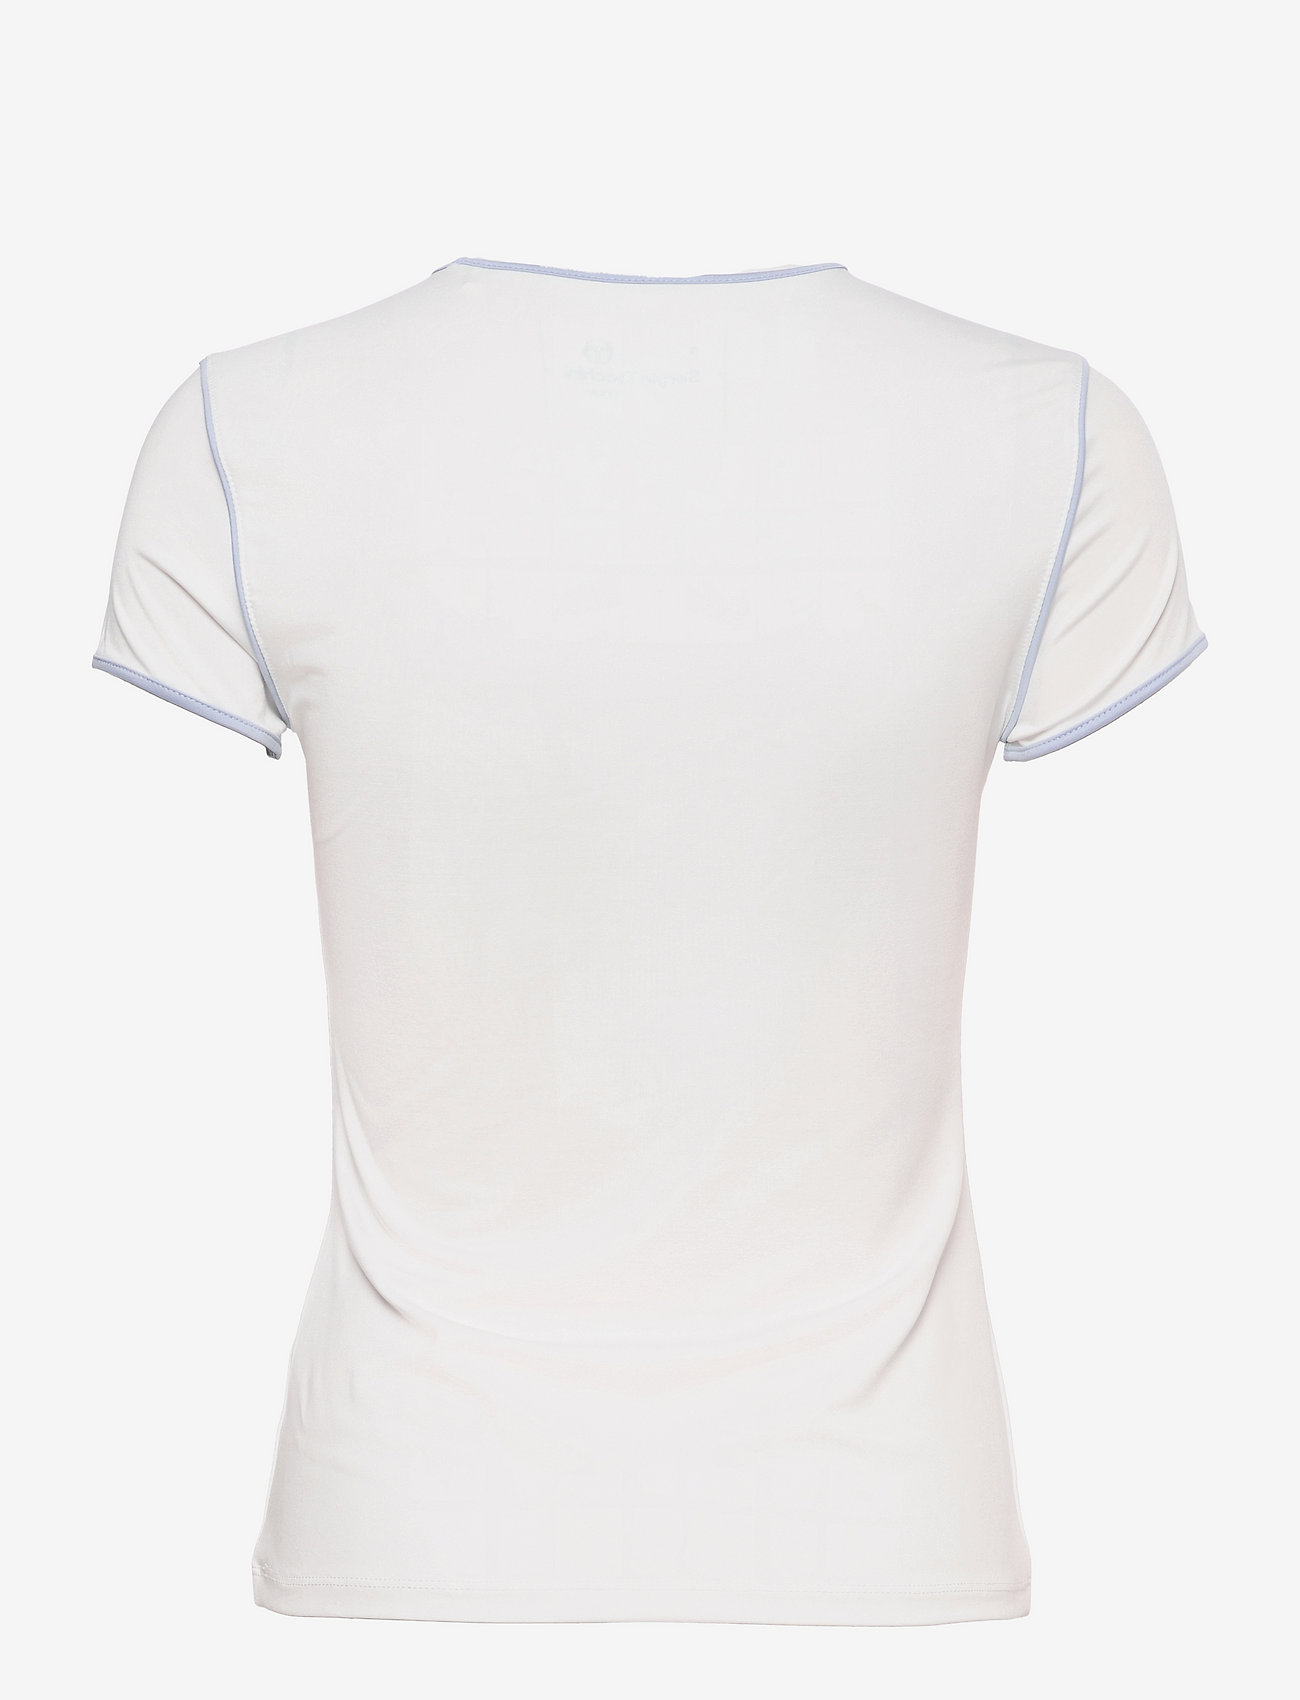 Sergio Tacchini - TCP TSHIRT SS WOMAN - t-shirts - 135 blanc de blanc/kentucky blue - 1